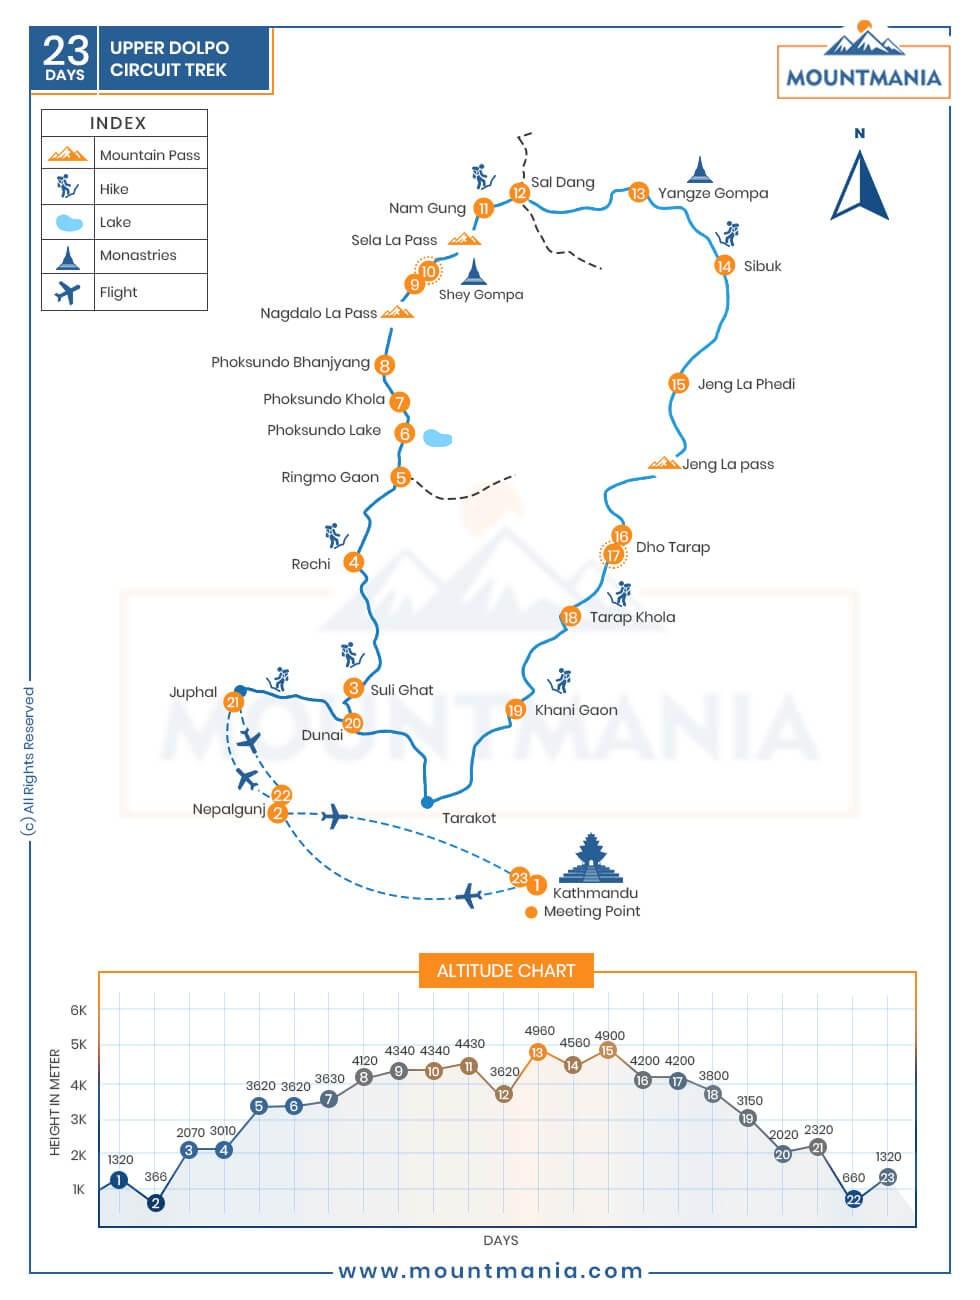 Upper Dolpo Circuit Trek map